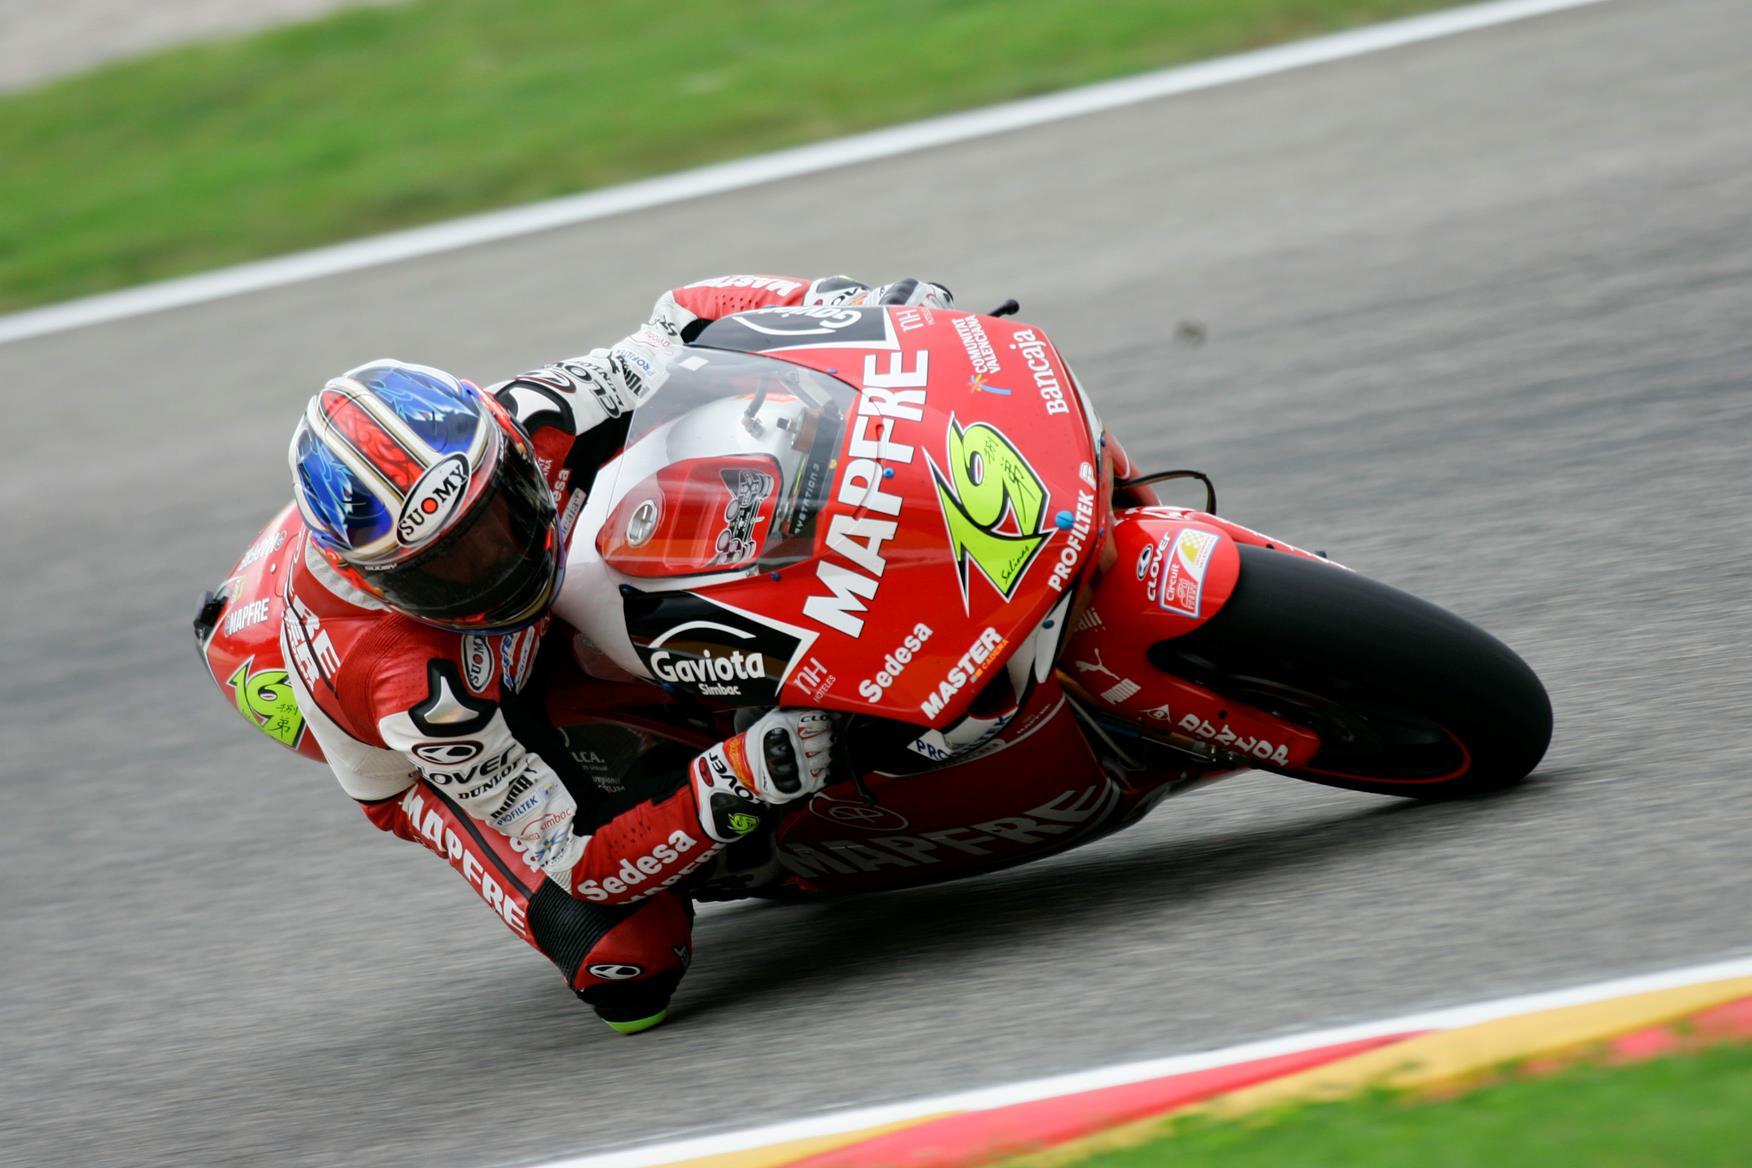 9b1271f7fa Alvaro Bautista set the fastest time in the 250cc free practice session